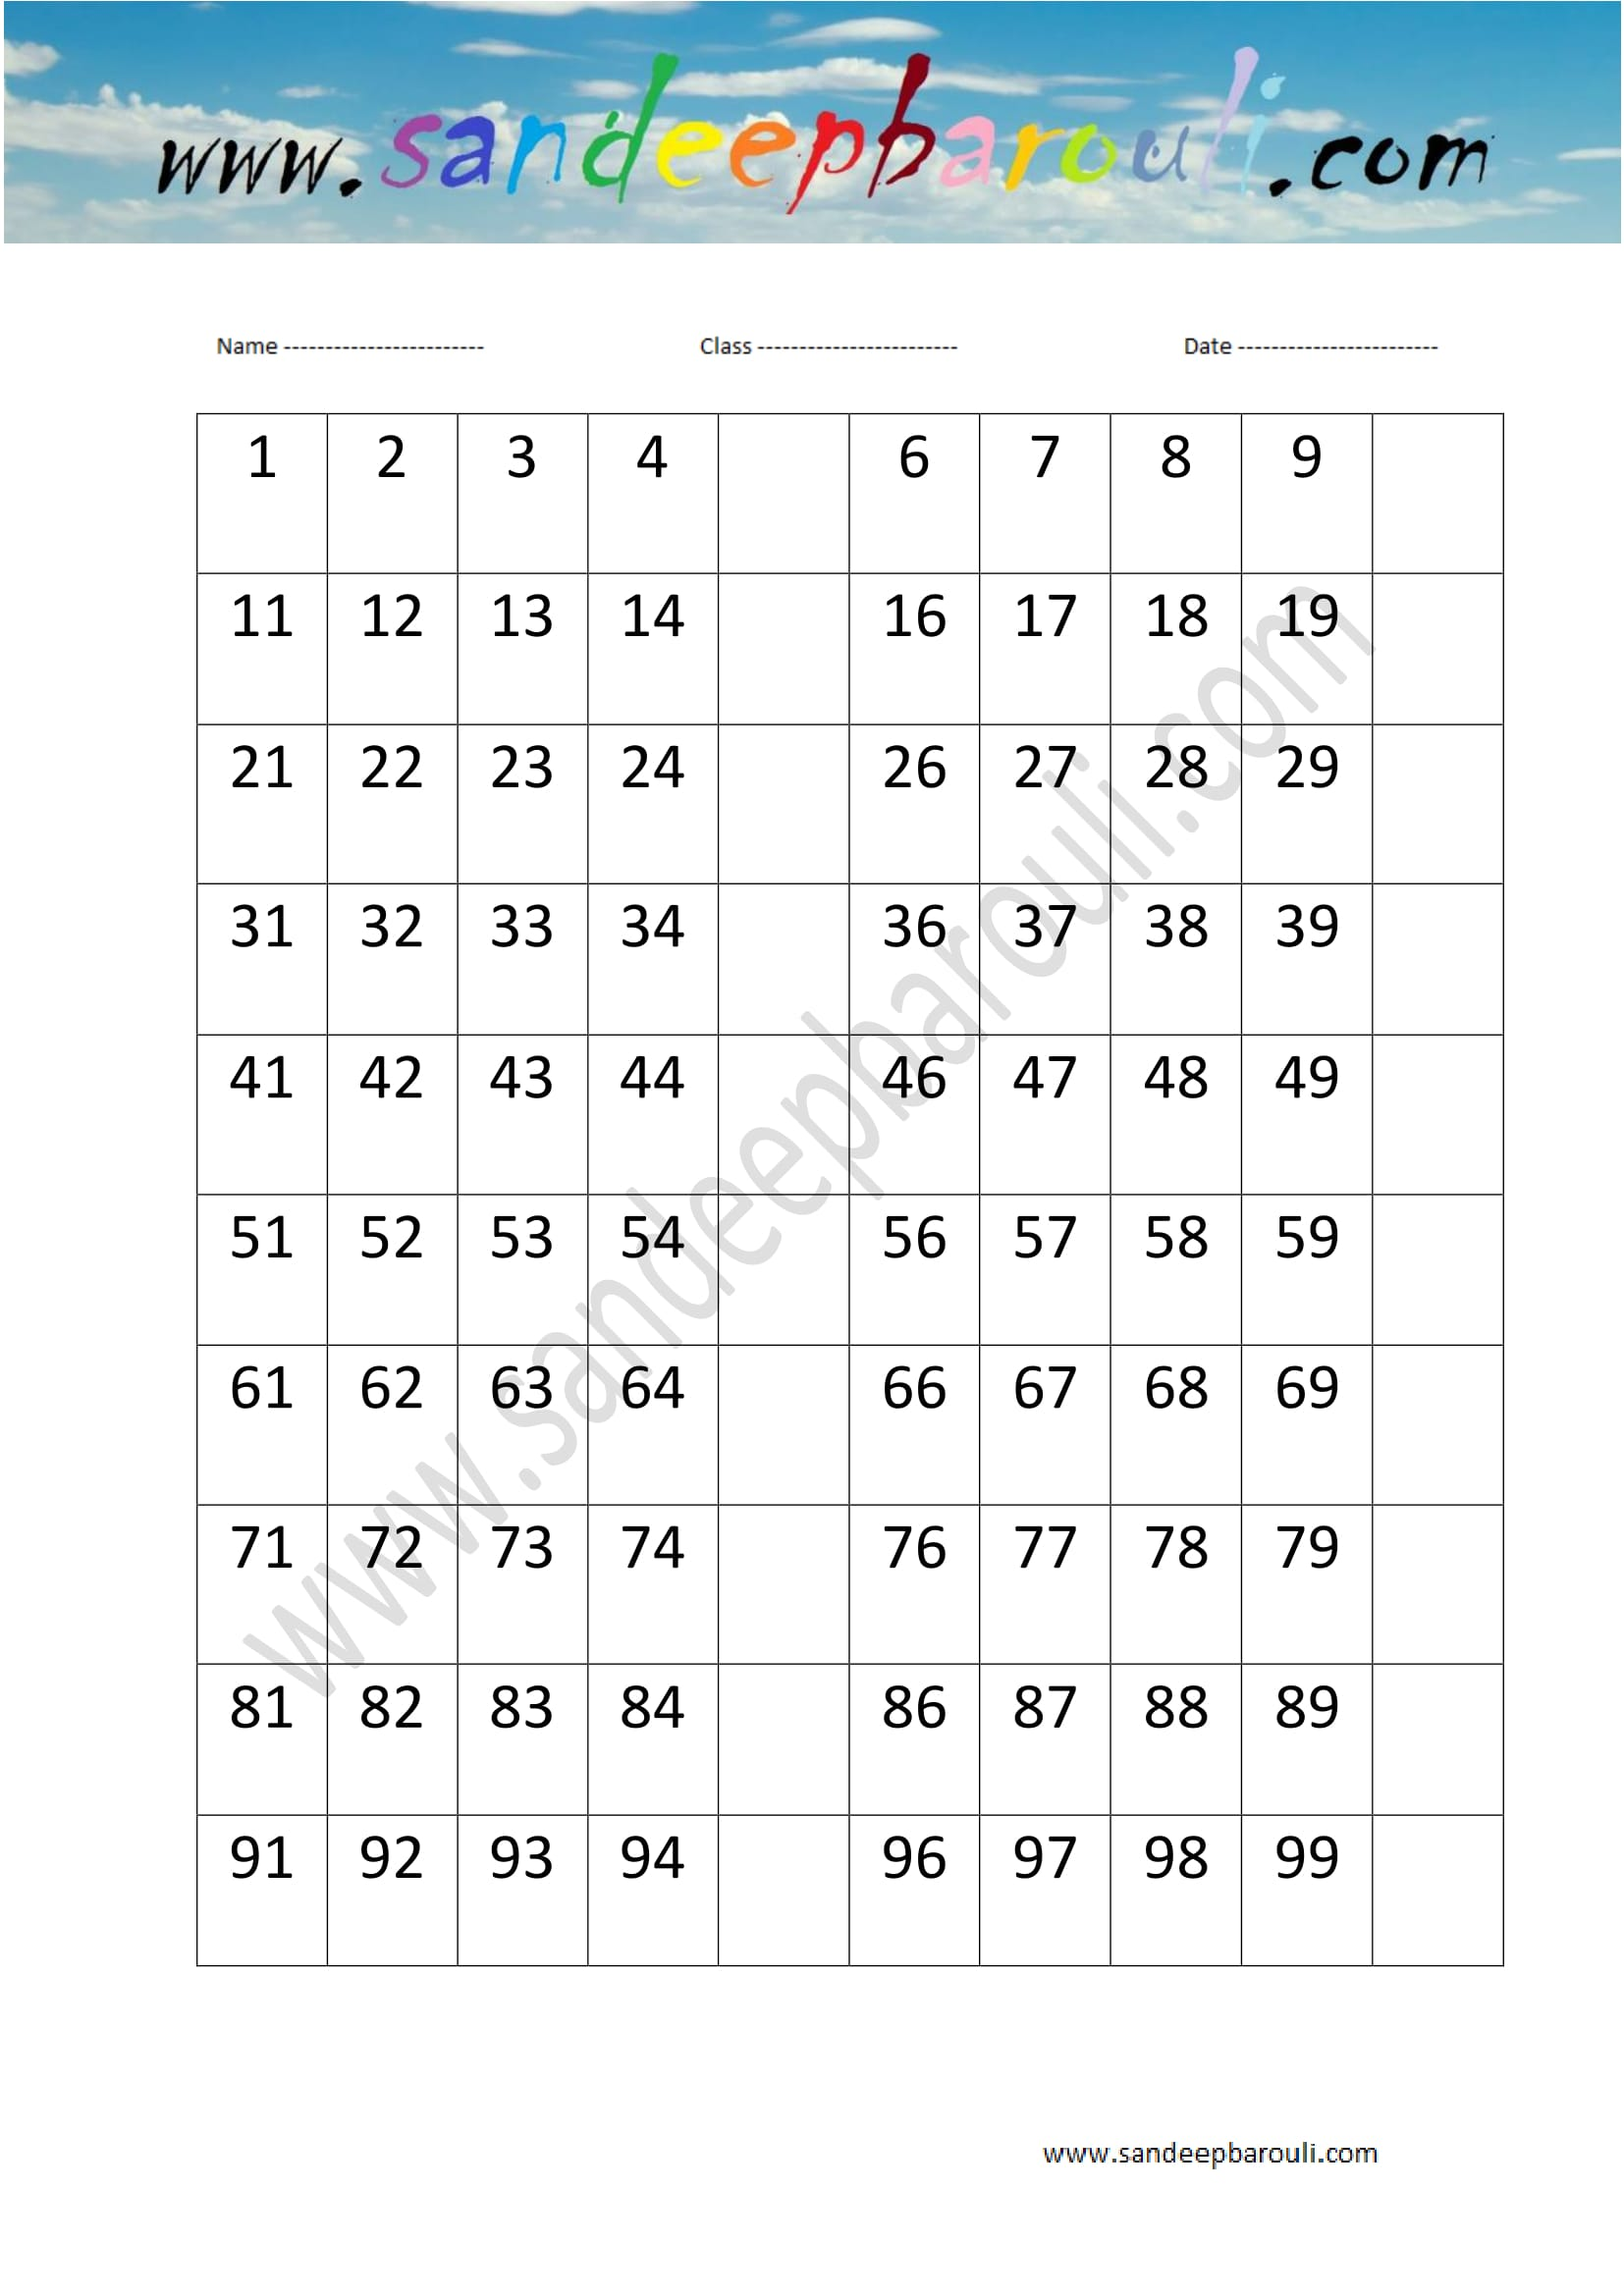 Math Worksheets For Kids 53 Sandeepbarouli